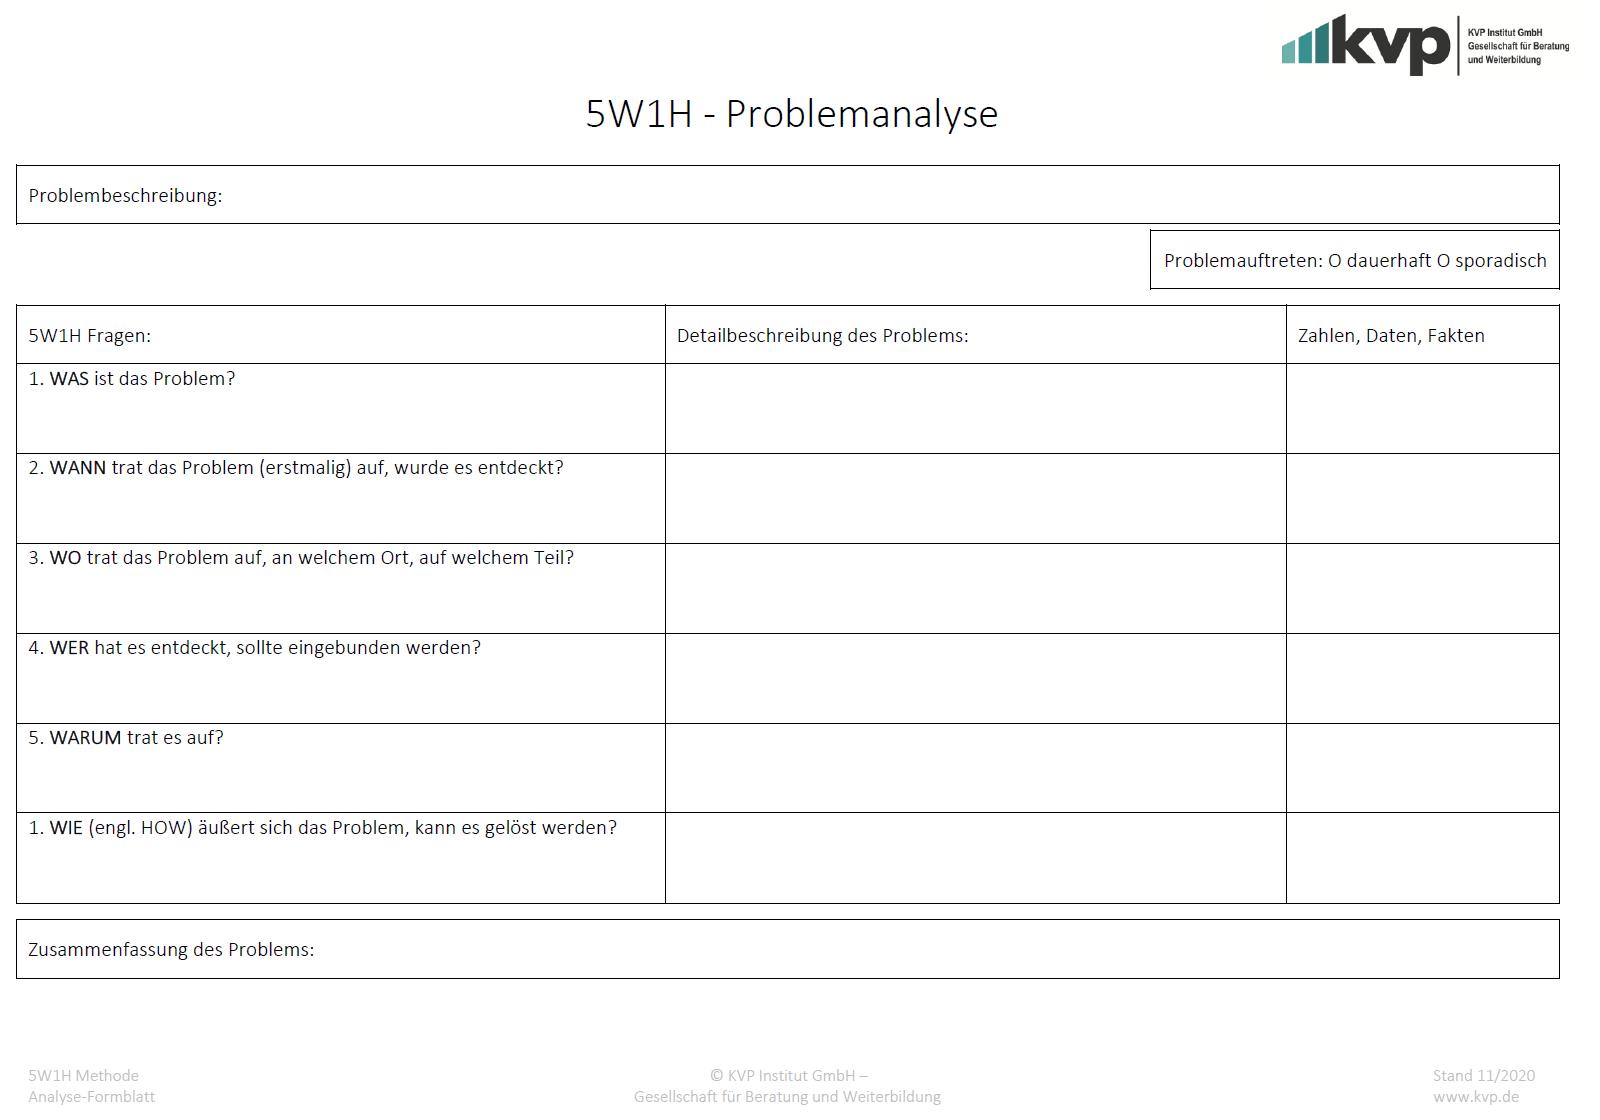 5W1H Problemanalyse